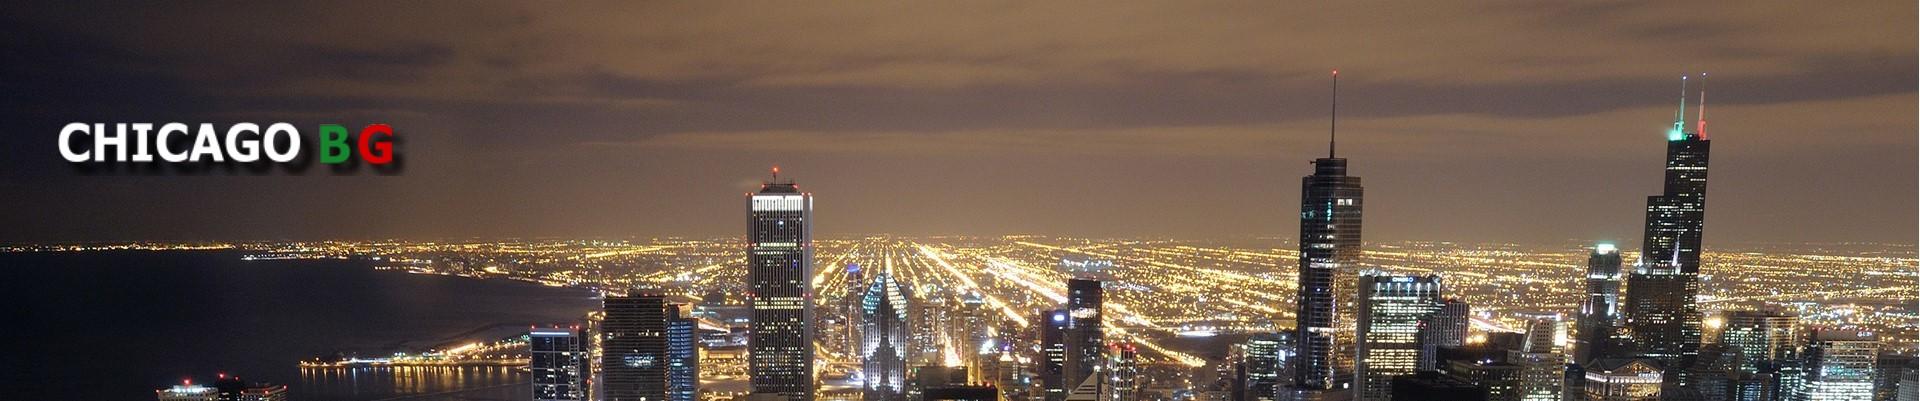 Chicago.bg logo